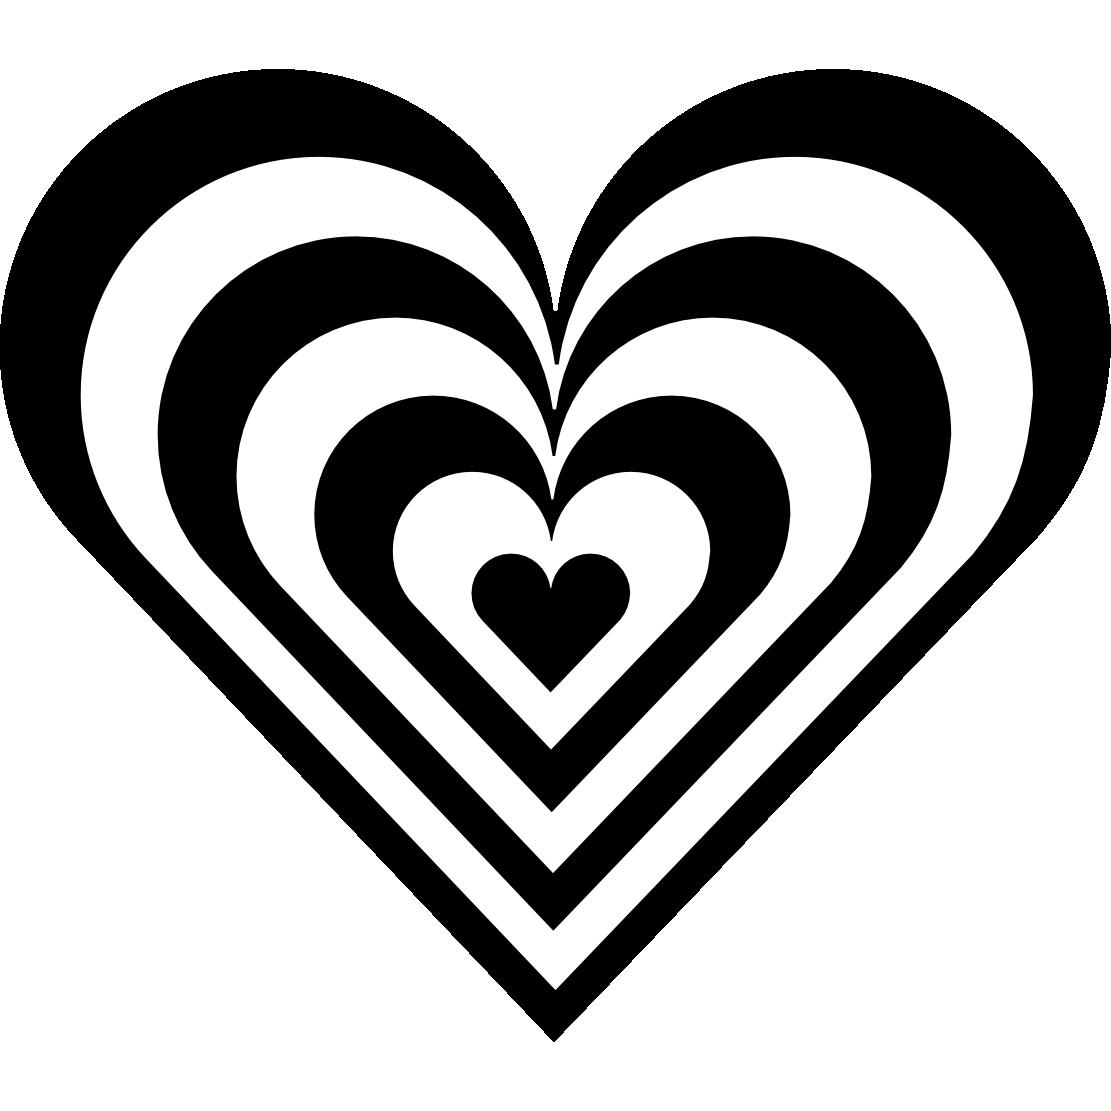 Heart black and white. Hearts clipart nurse